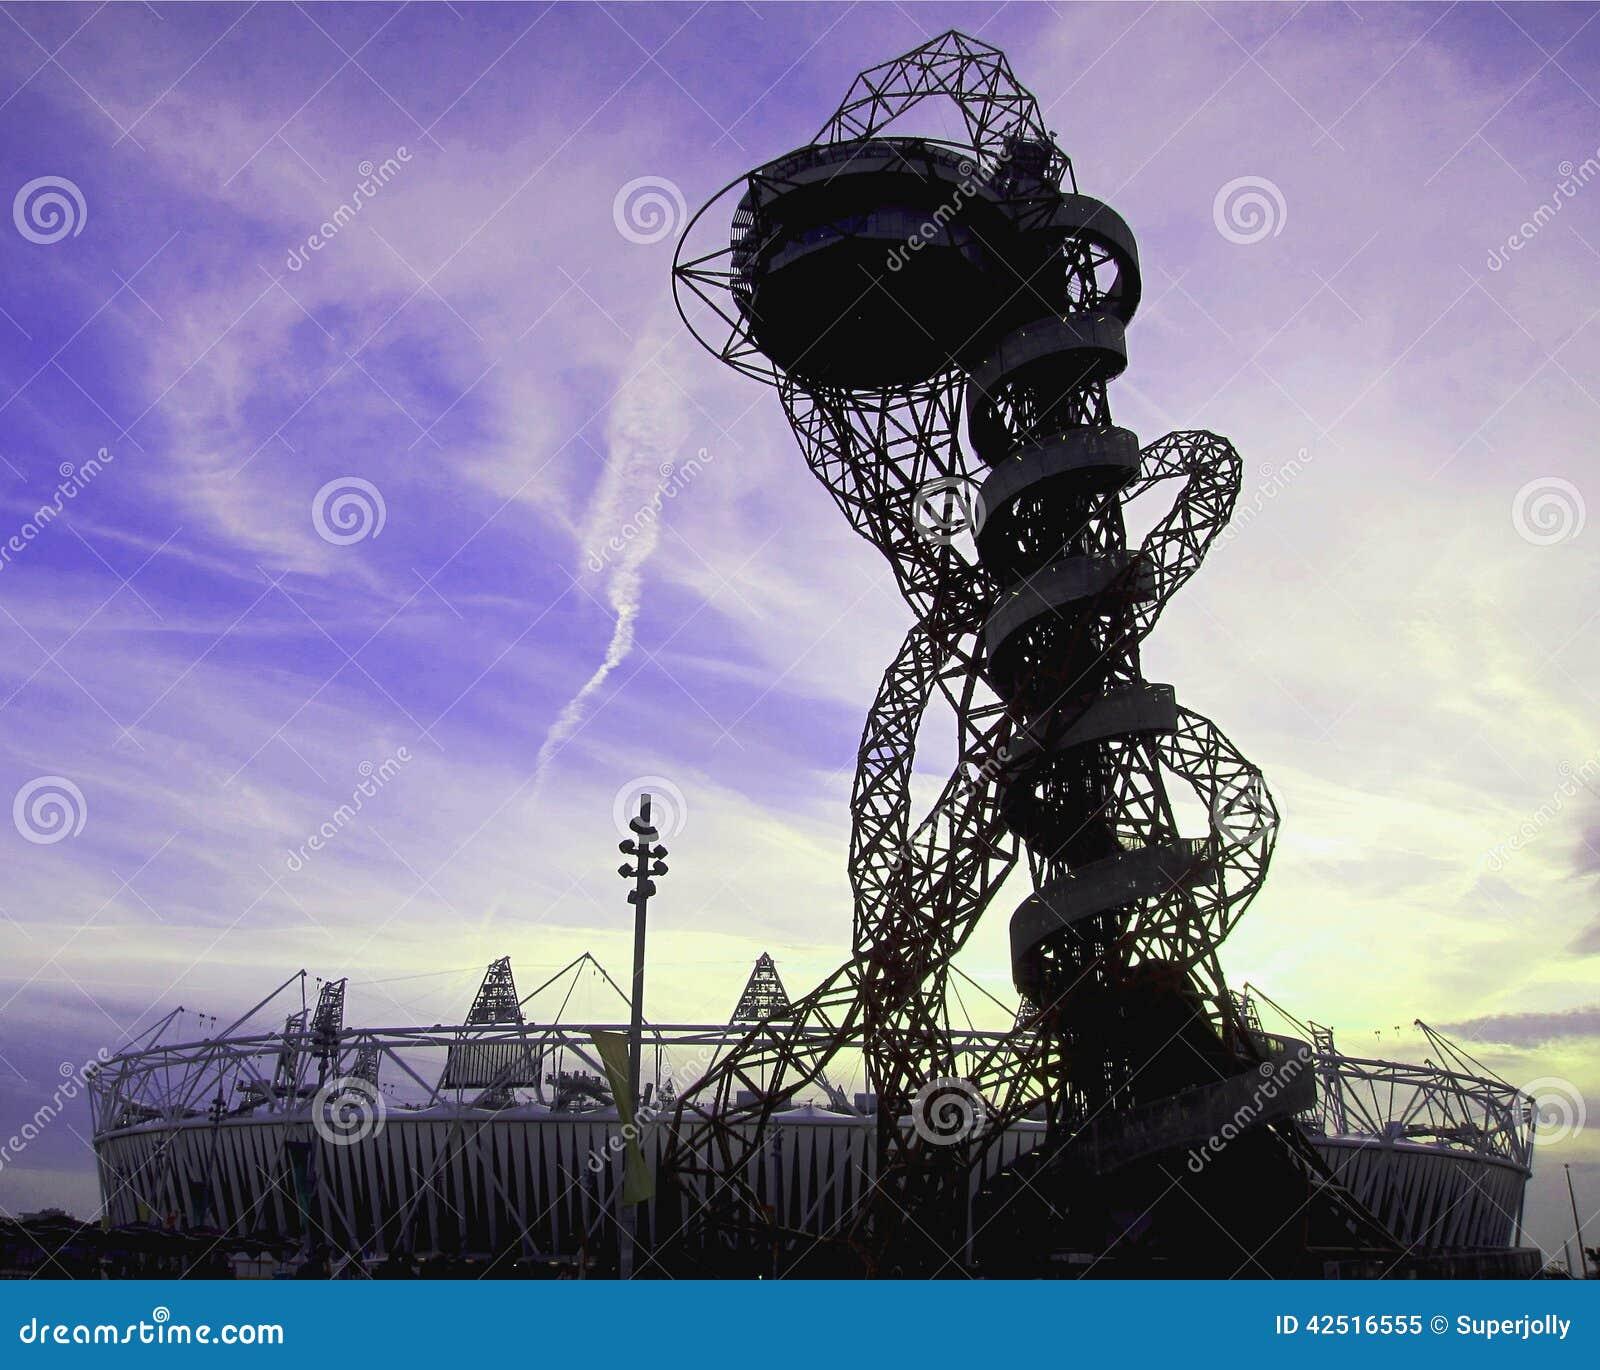 London olympics 2012 arcelormittal orbit editorial image image london olympics 2012 arcelormittal orbit editorial stock photo buycottarizona